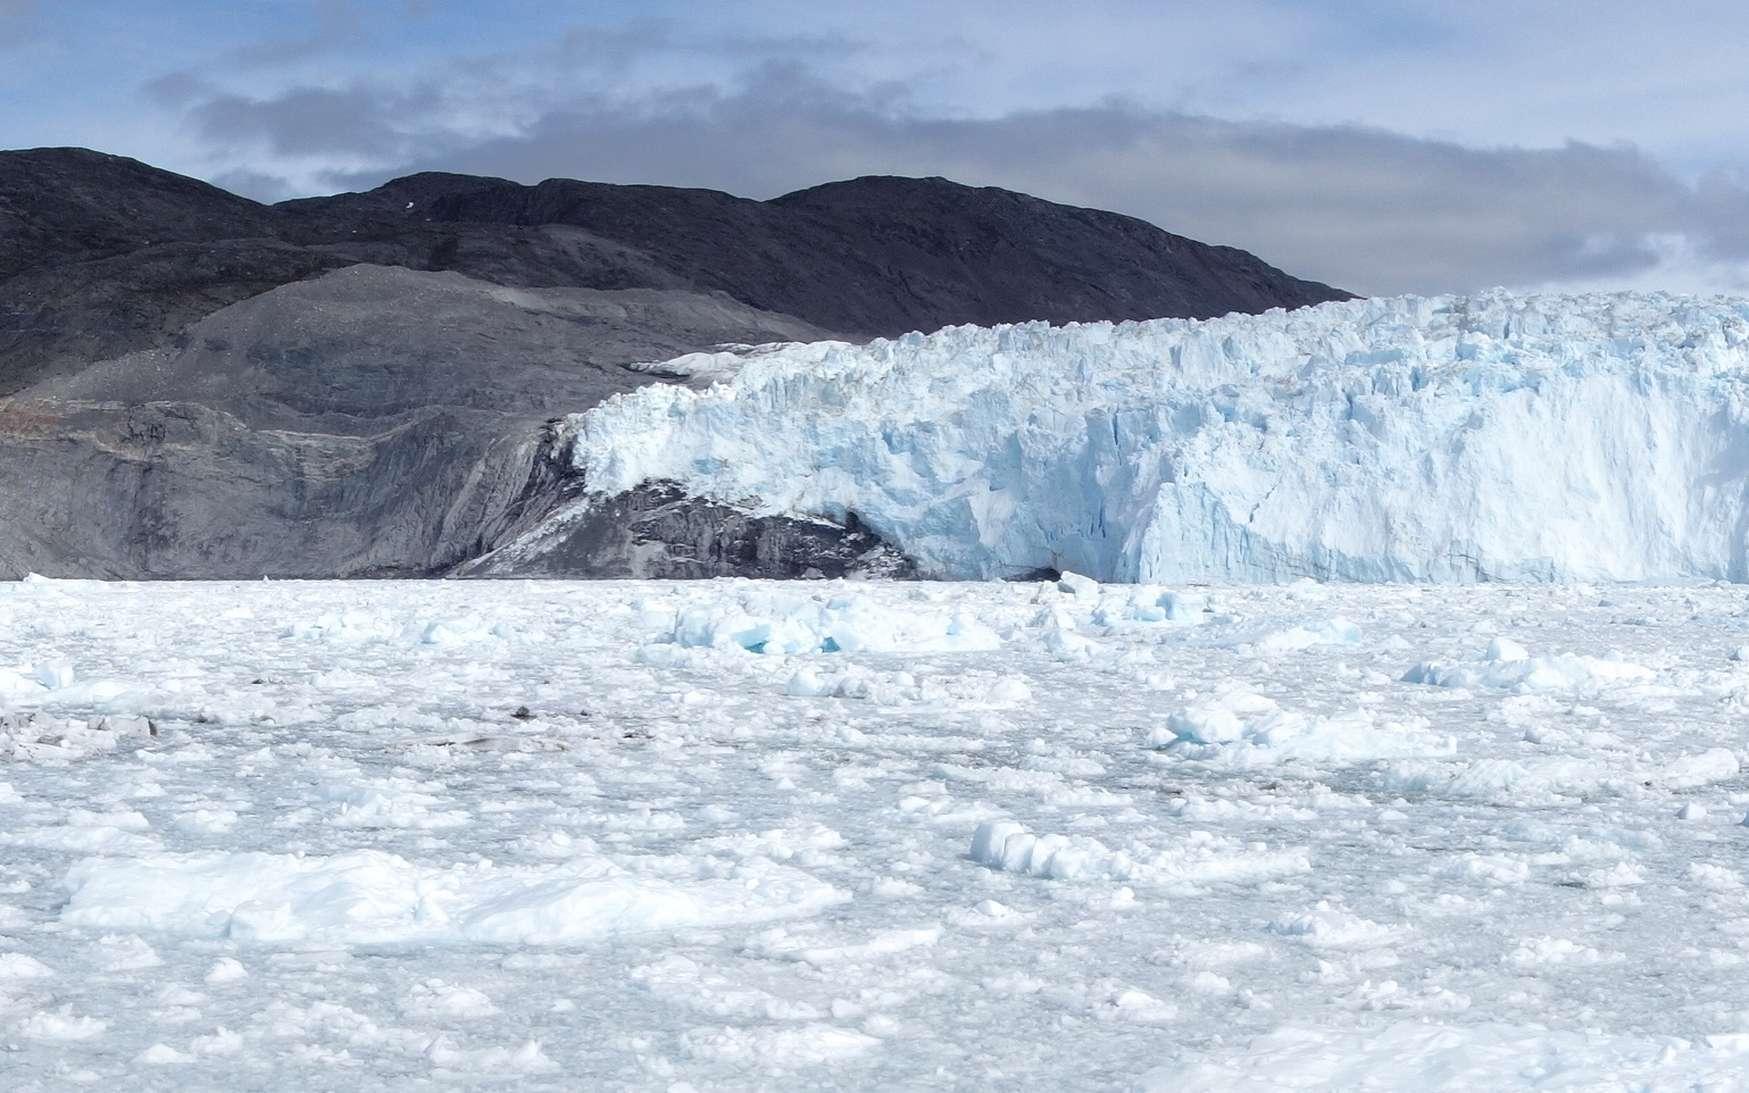 Le glacier Eqi au Groenland. © Hortigüela, Fotolia